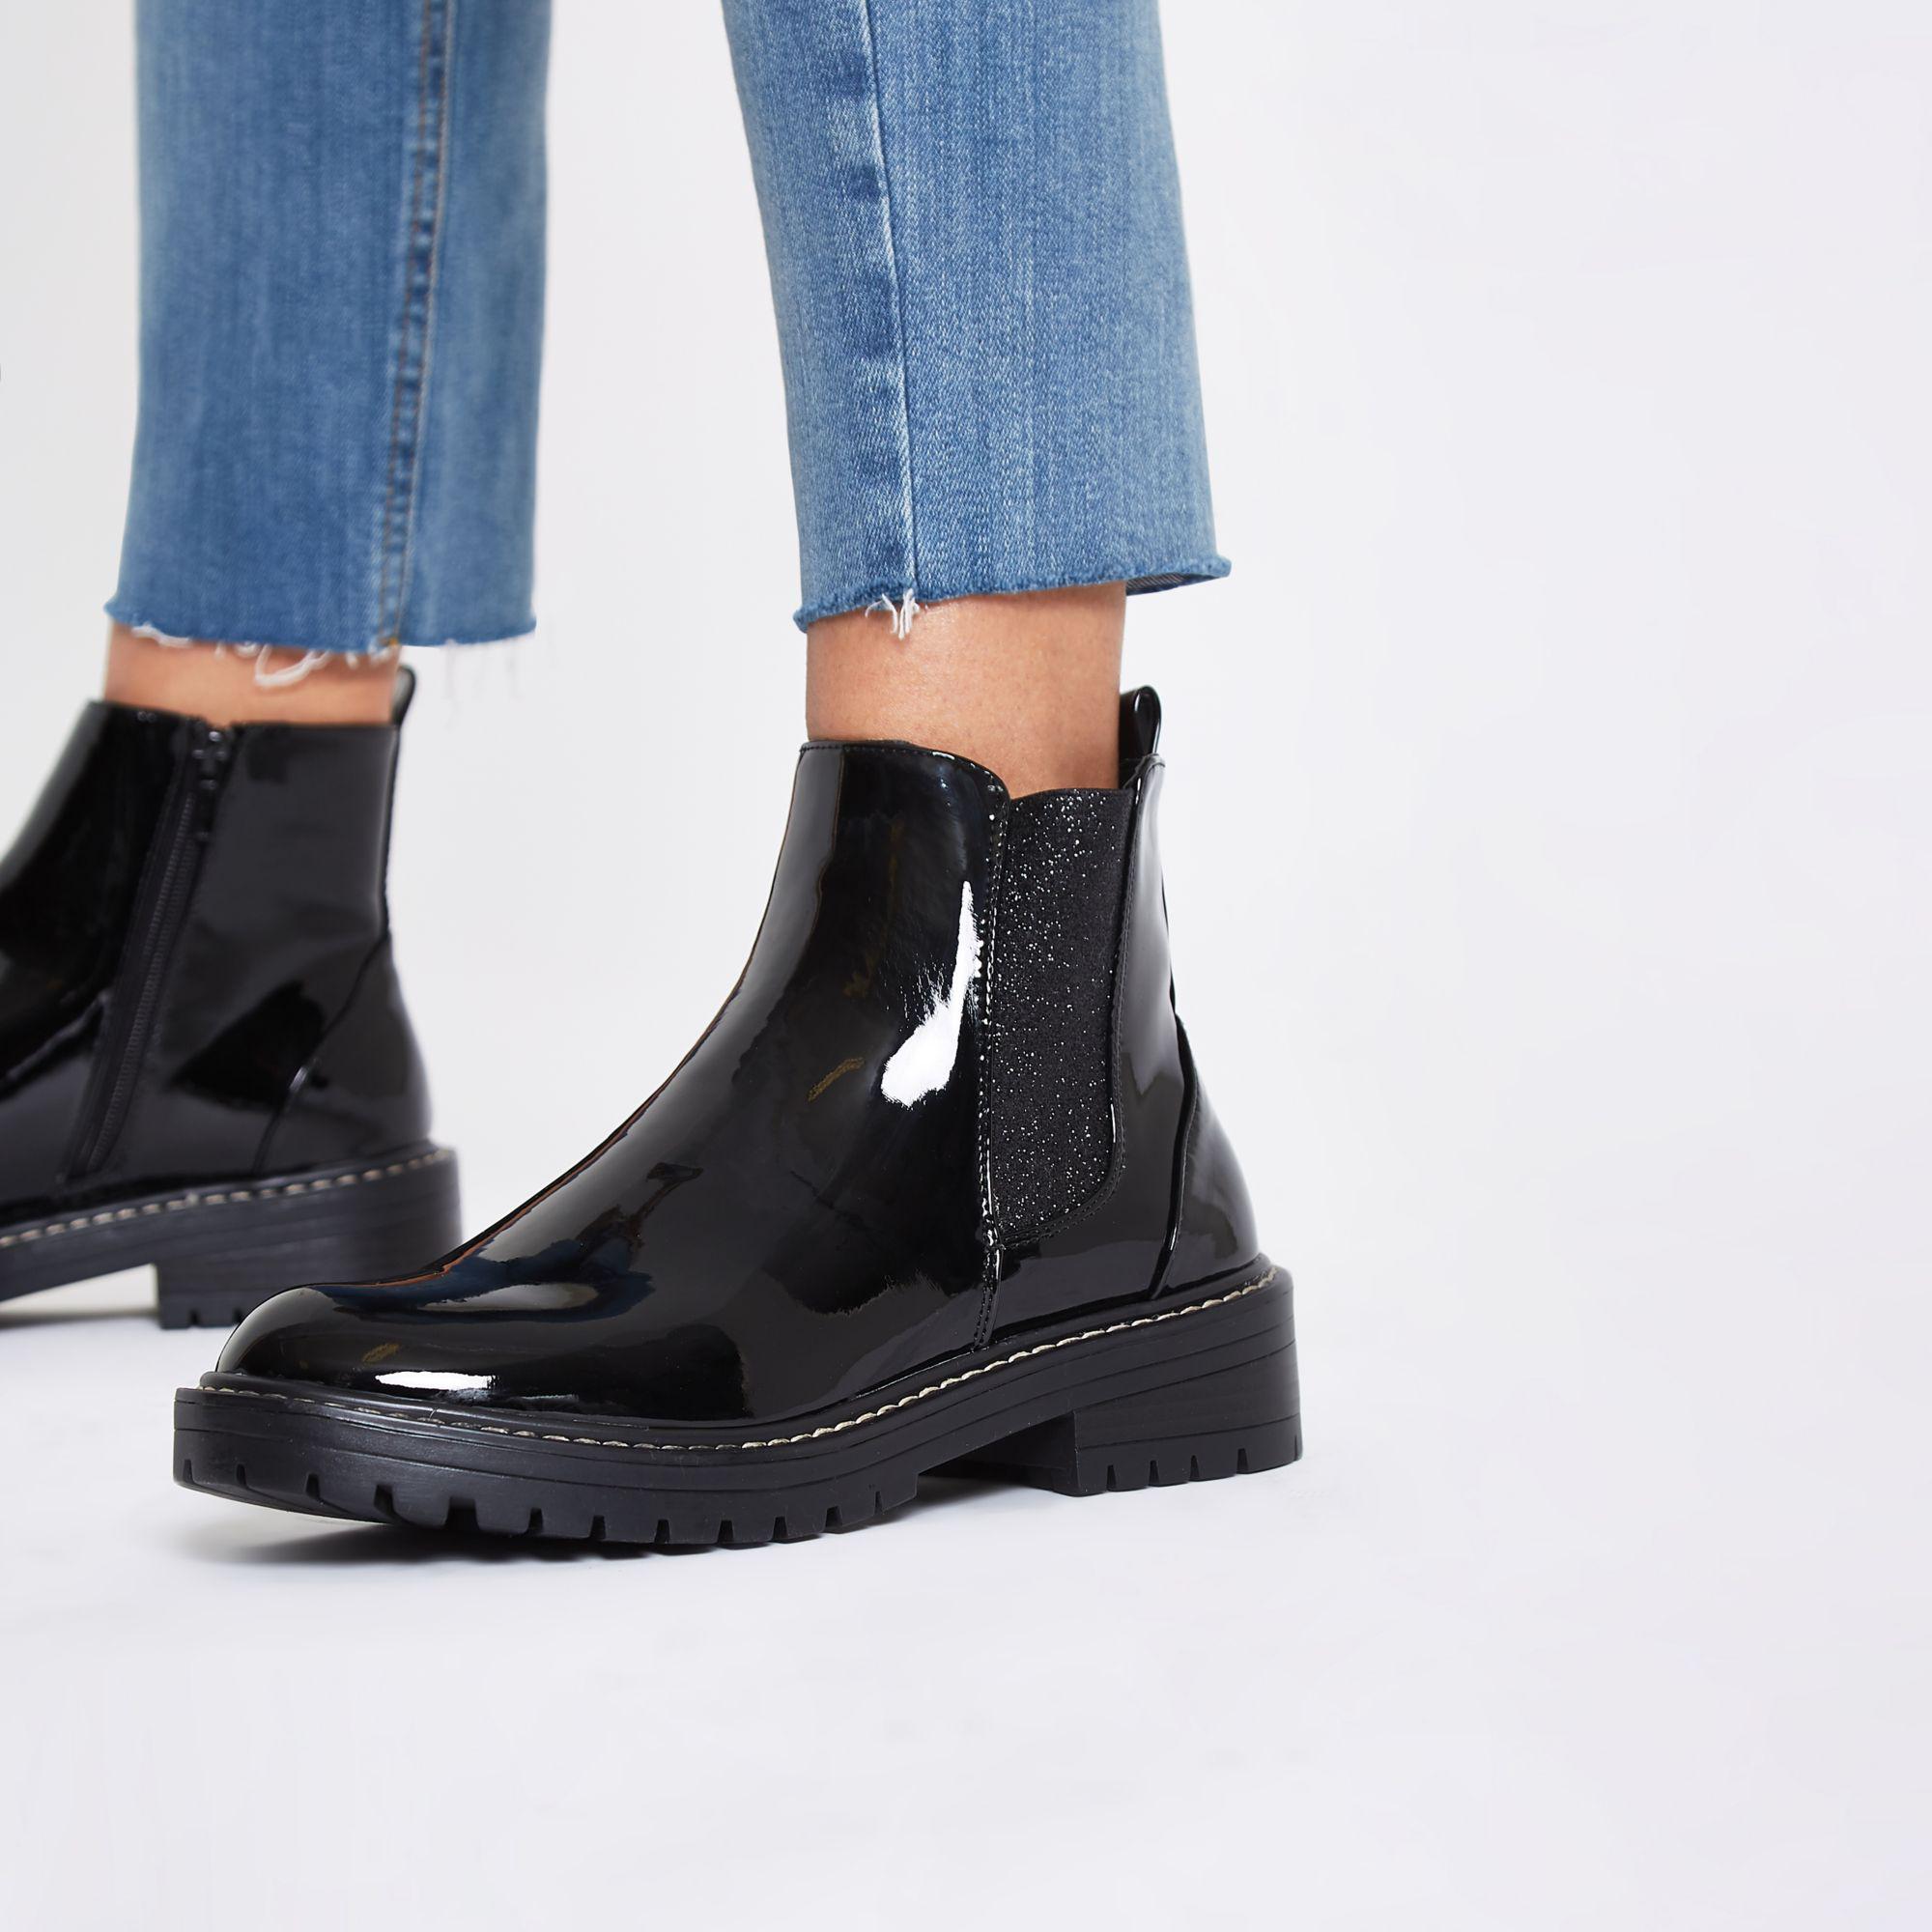 river island svart patent støvler